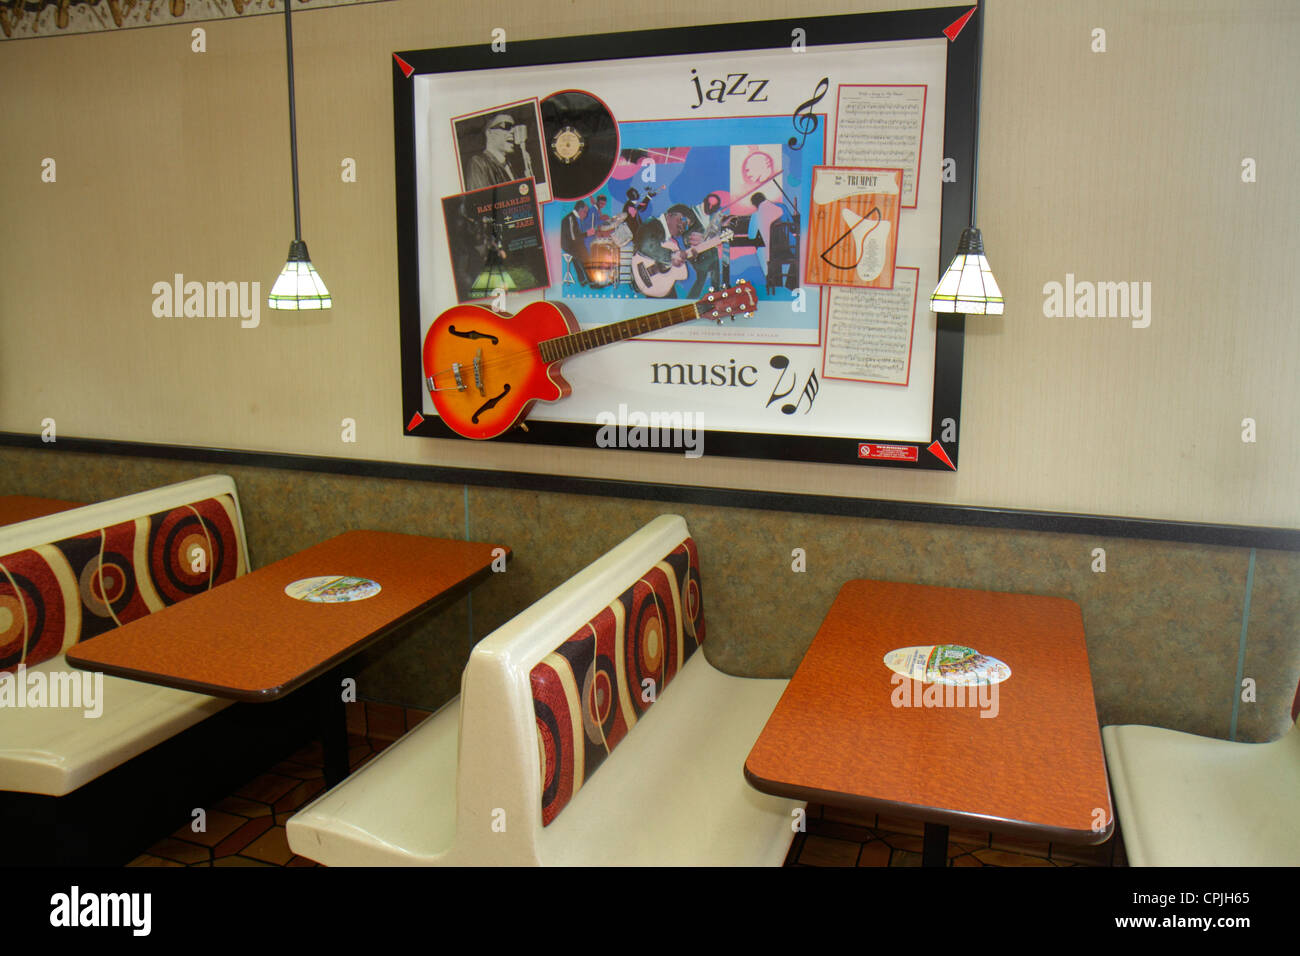 Miami florida mcdonald s fast food restaurant interior